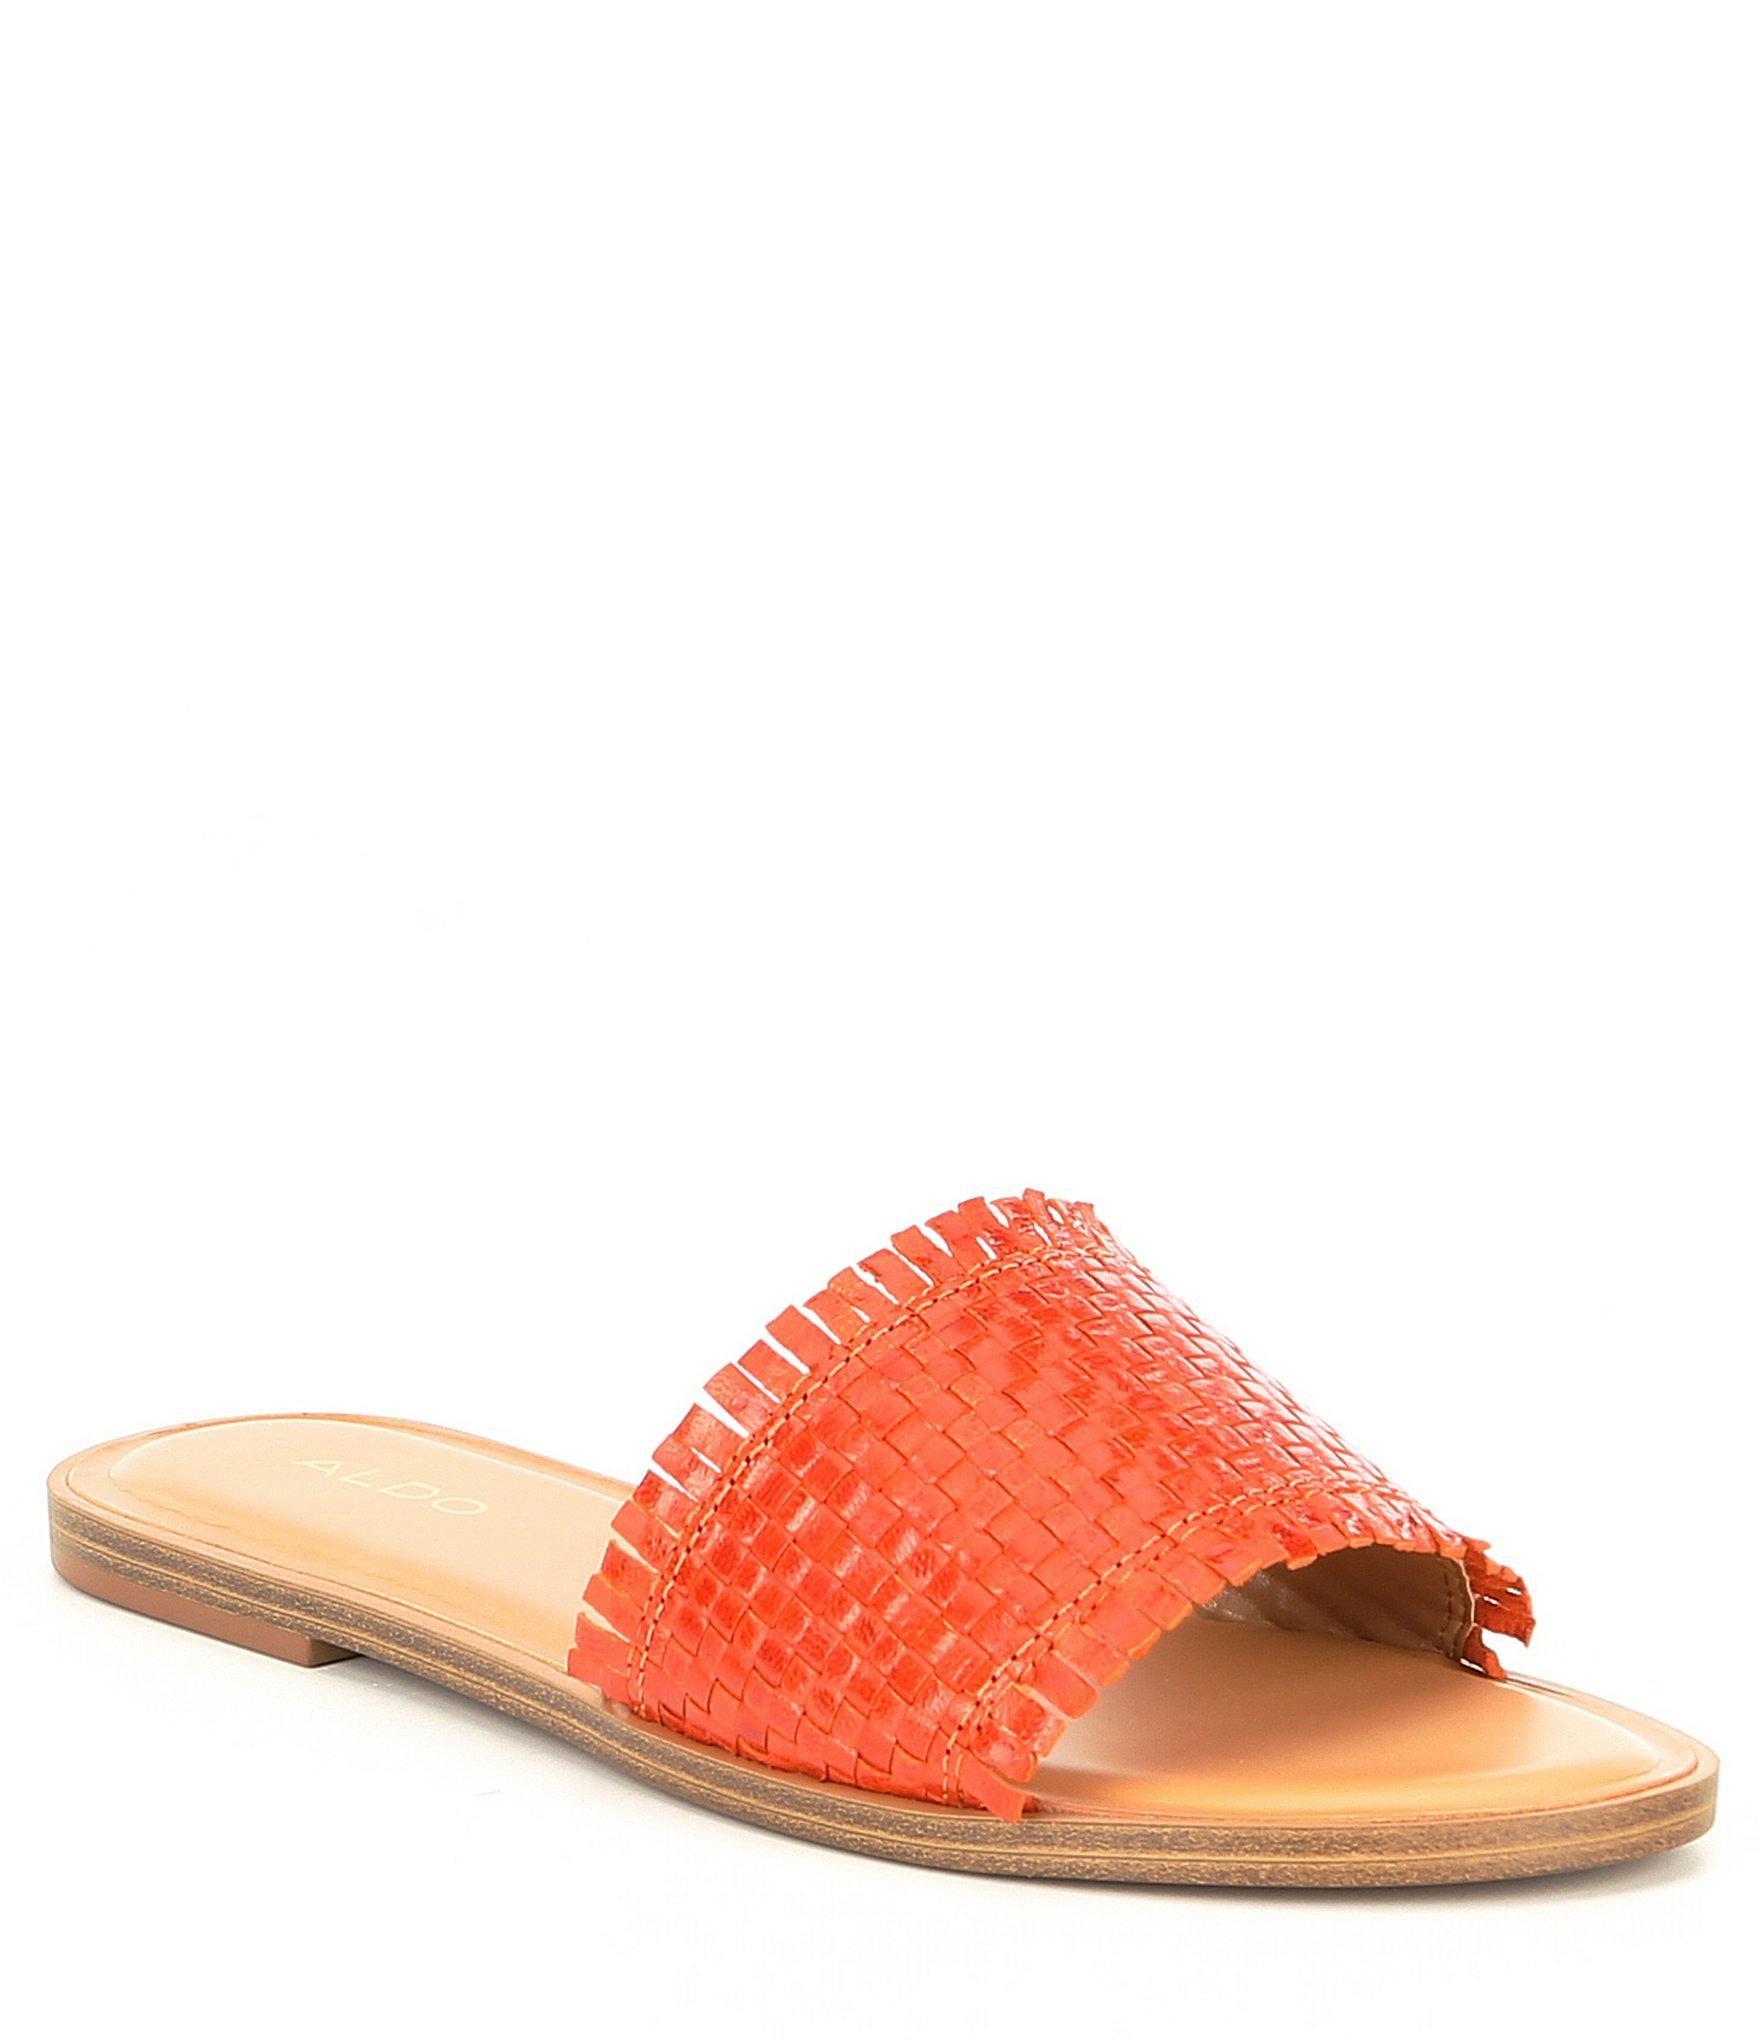 af7e5b0ef026 Lyst - ALDO Larauclya Leather Woven Flat Slides in Orange